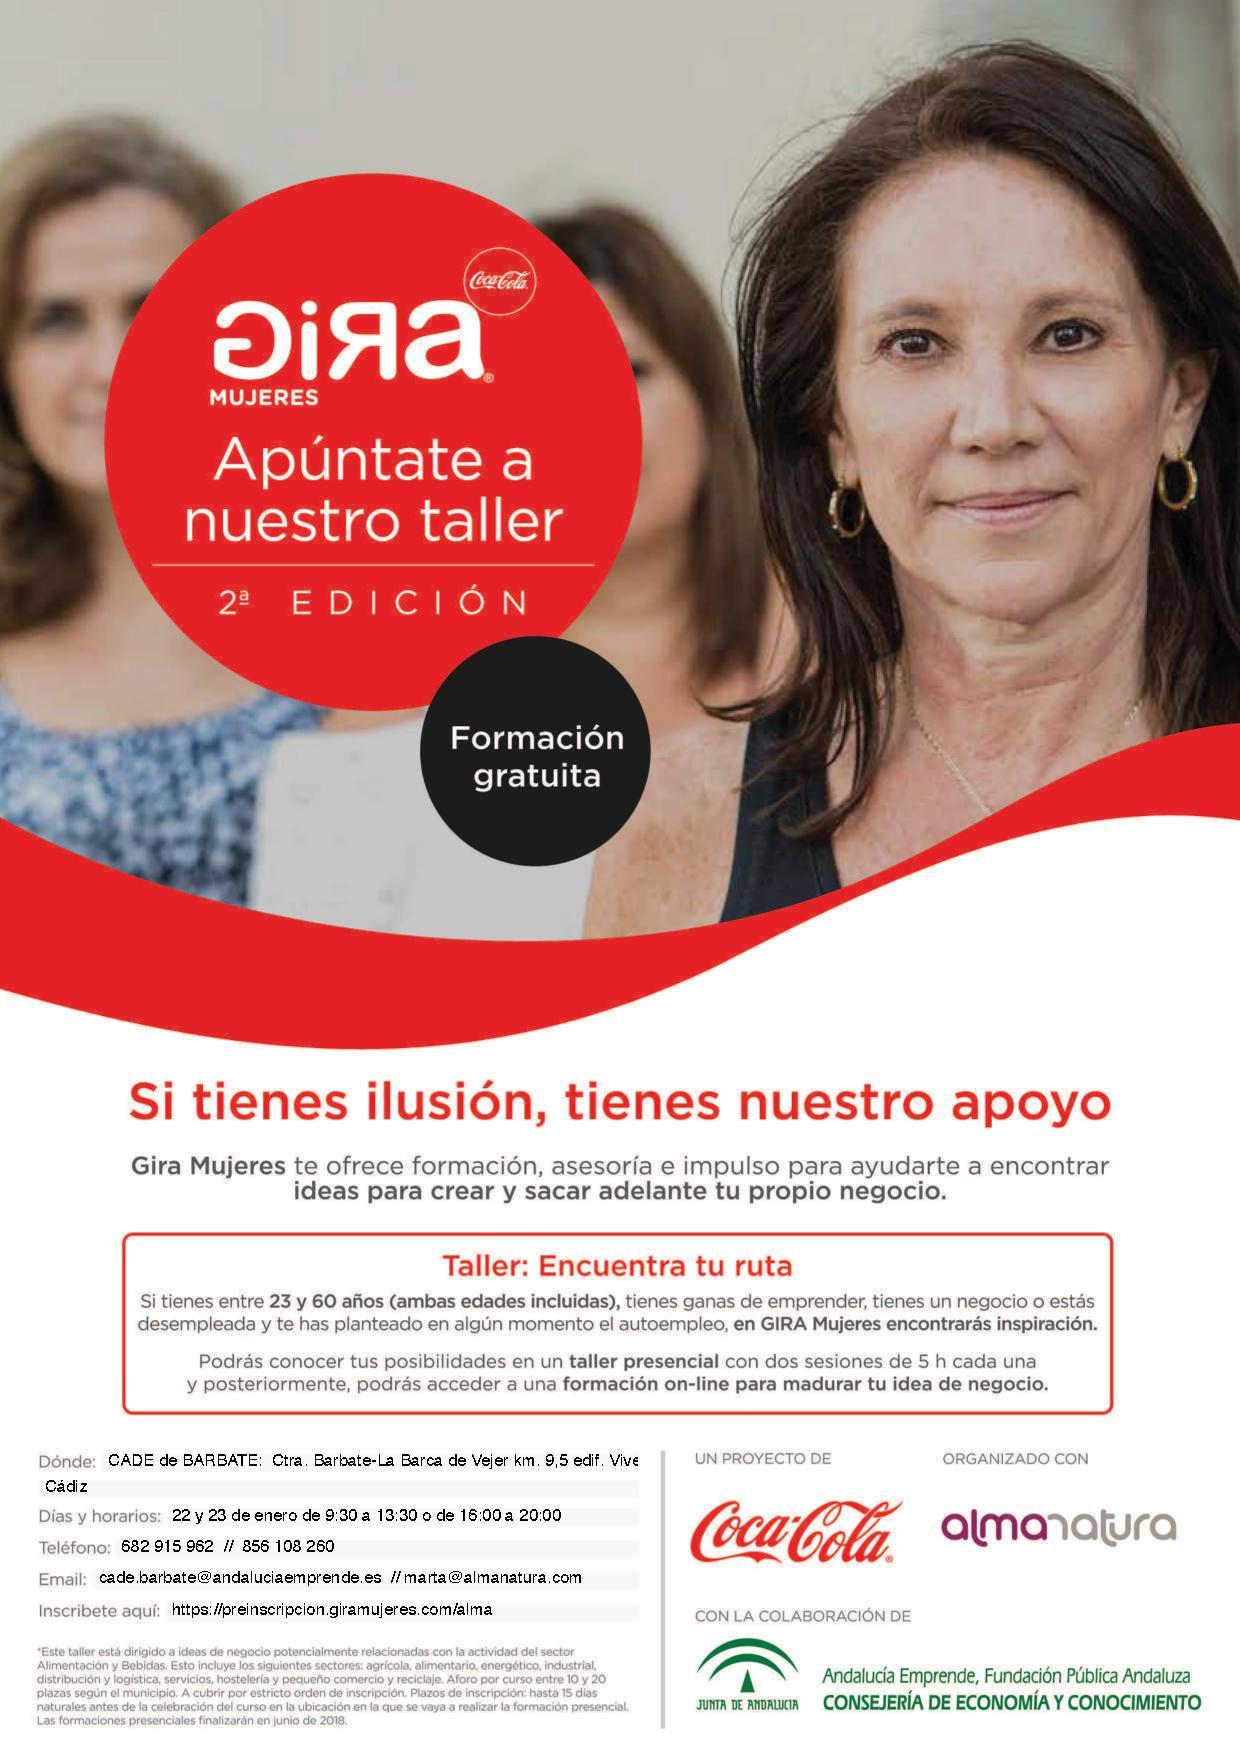 Cartel Gira Mujeres Coca Cola